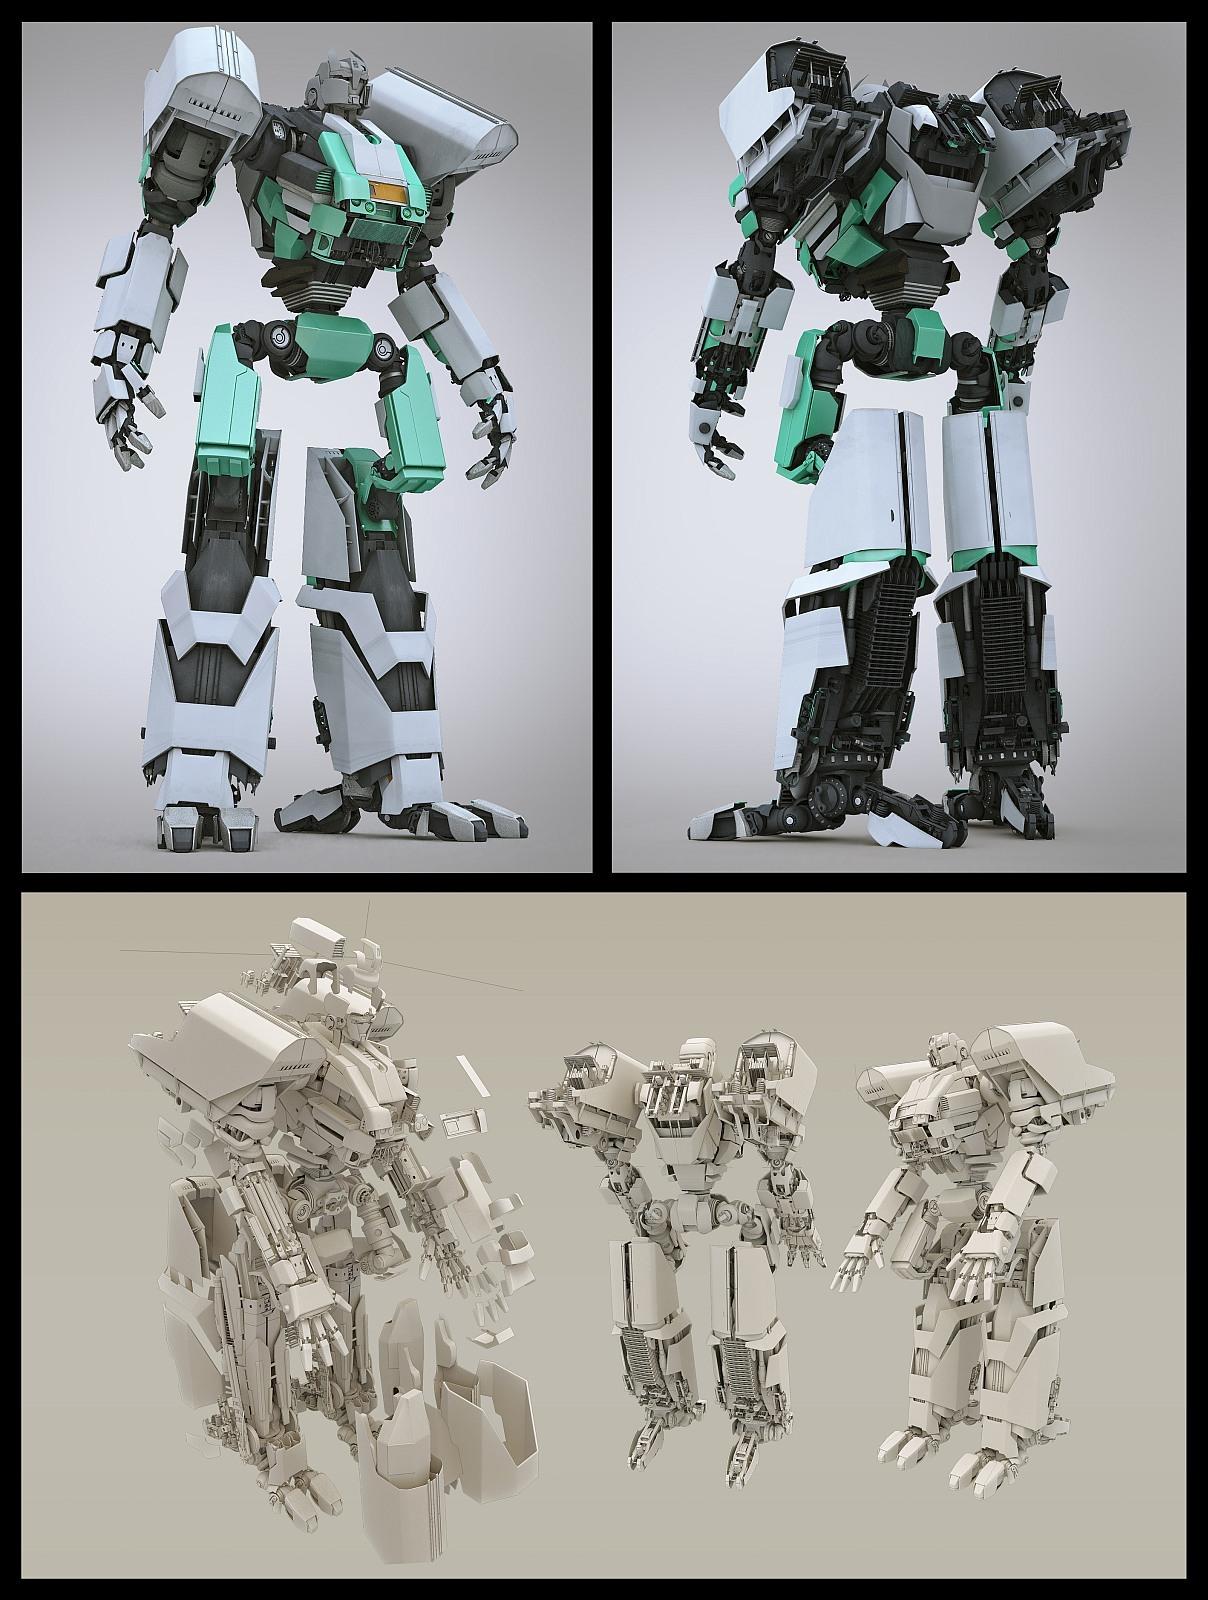 Kaddd robot 2 1 dcc9e604 zya0